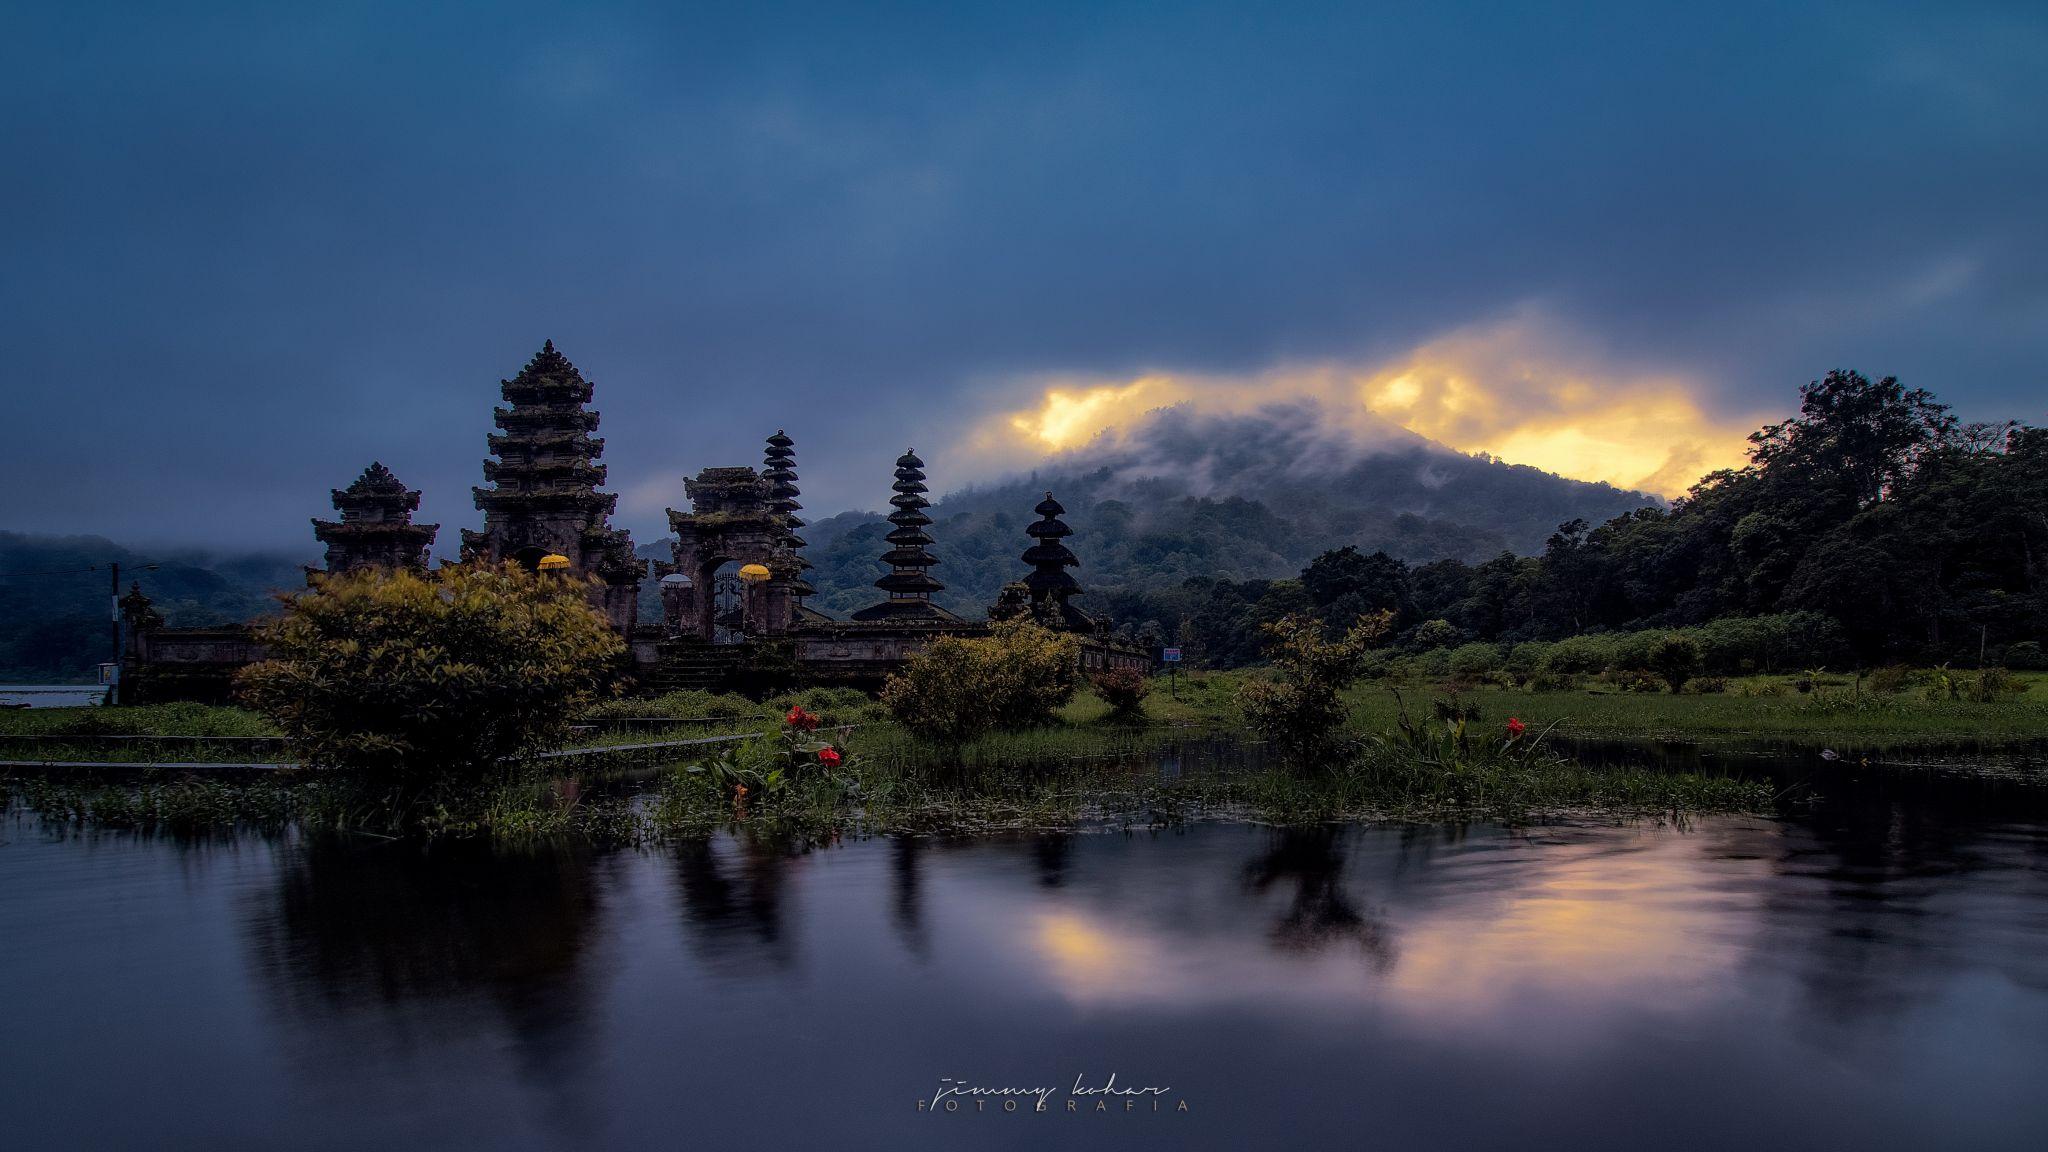 Pura Ulun Danu Tamblingan, Bali, Indonesia